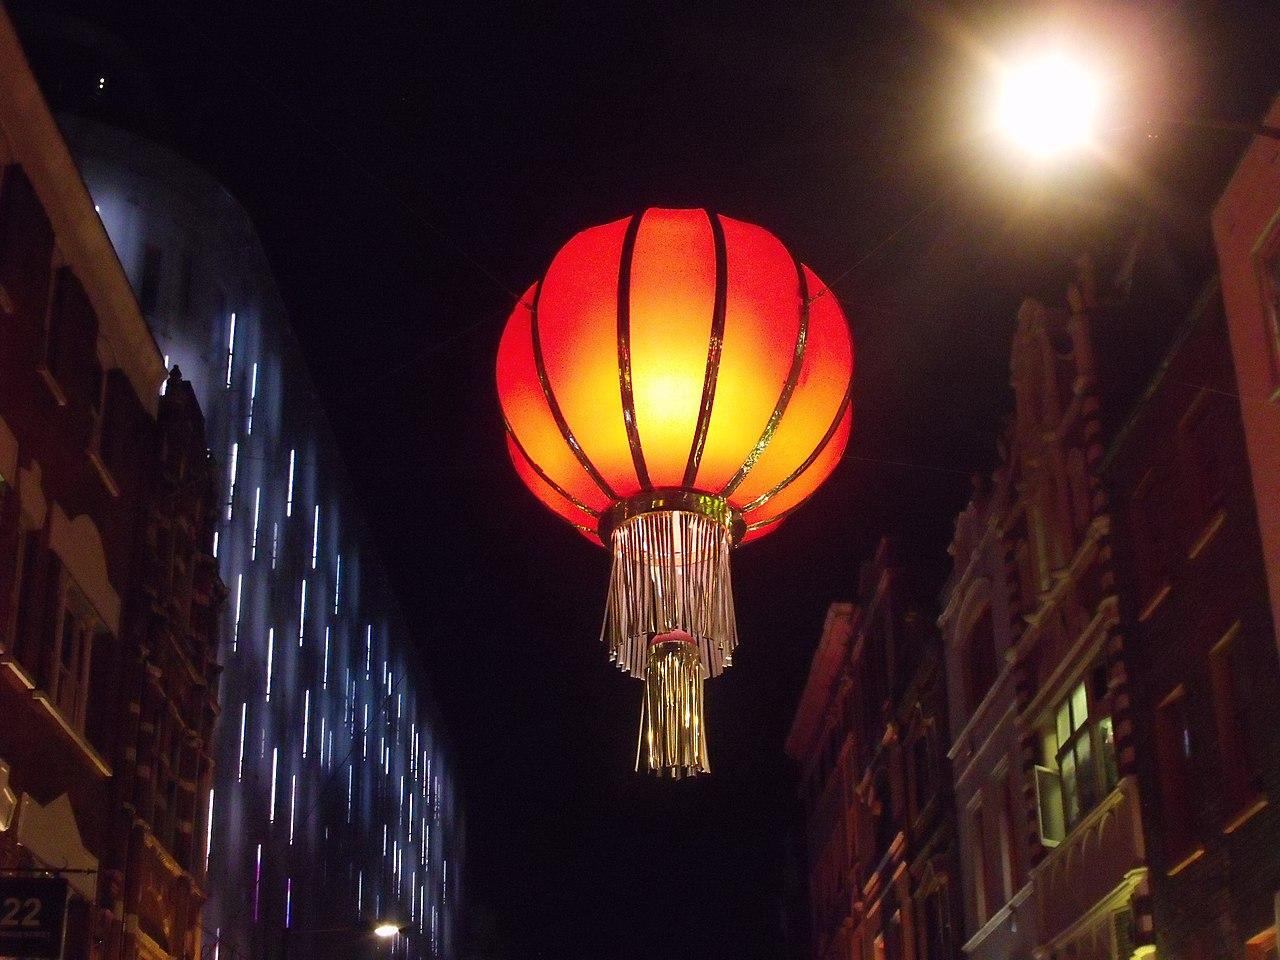 Lanterns Wallpaper Hd File Chinatown London Wardour Street Big Chinese